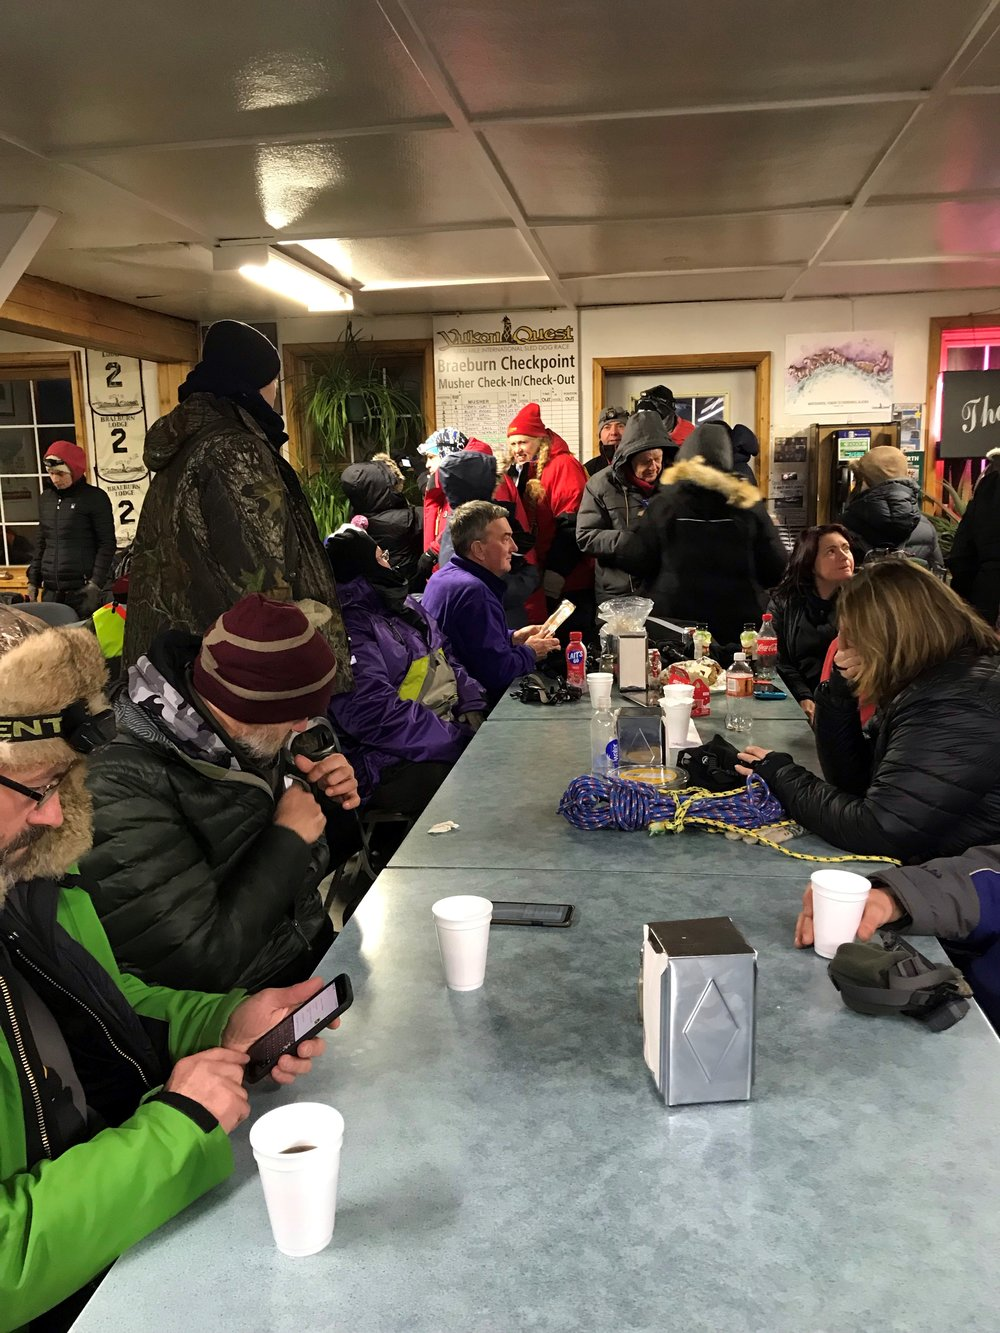 Handlers and fans waiting in Braeburn — REFRESH, REFRESH, REFRESH!